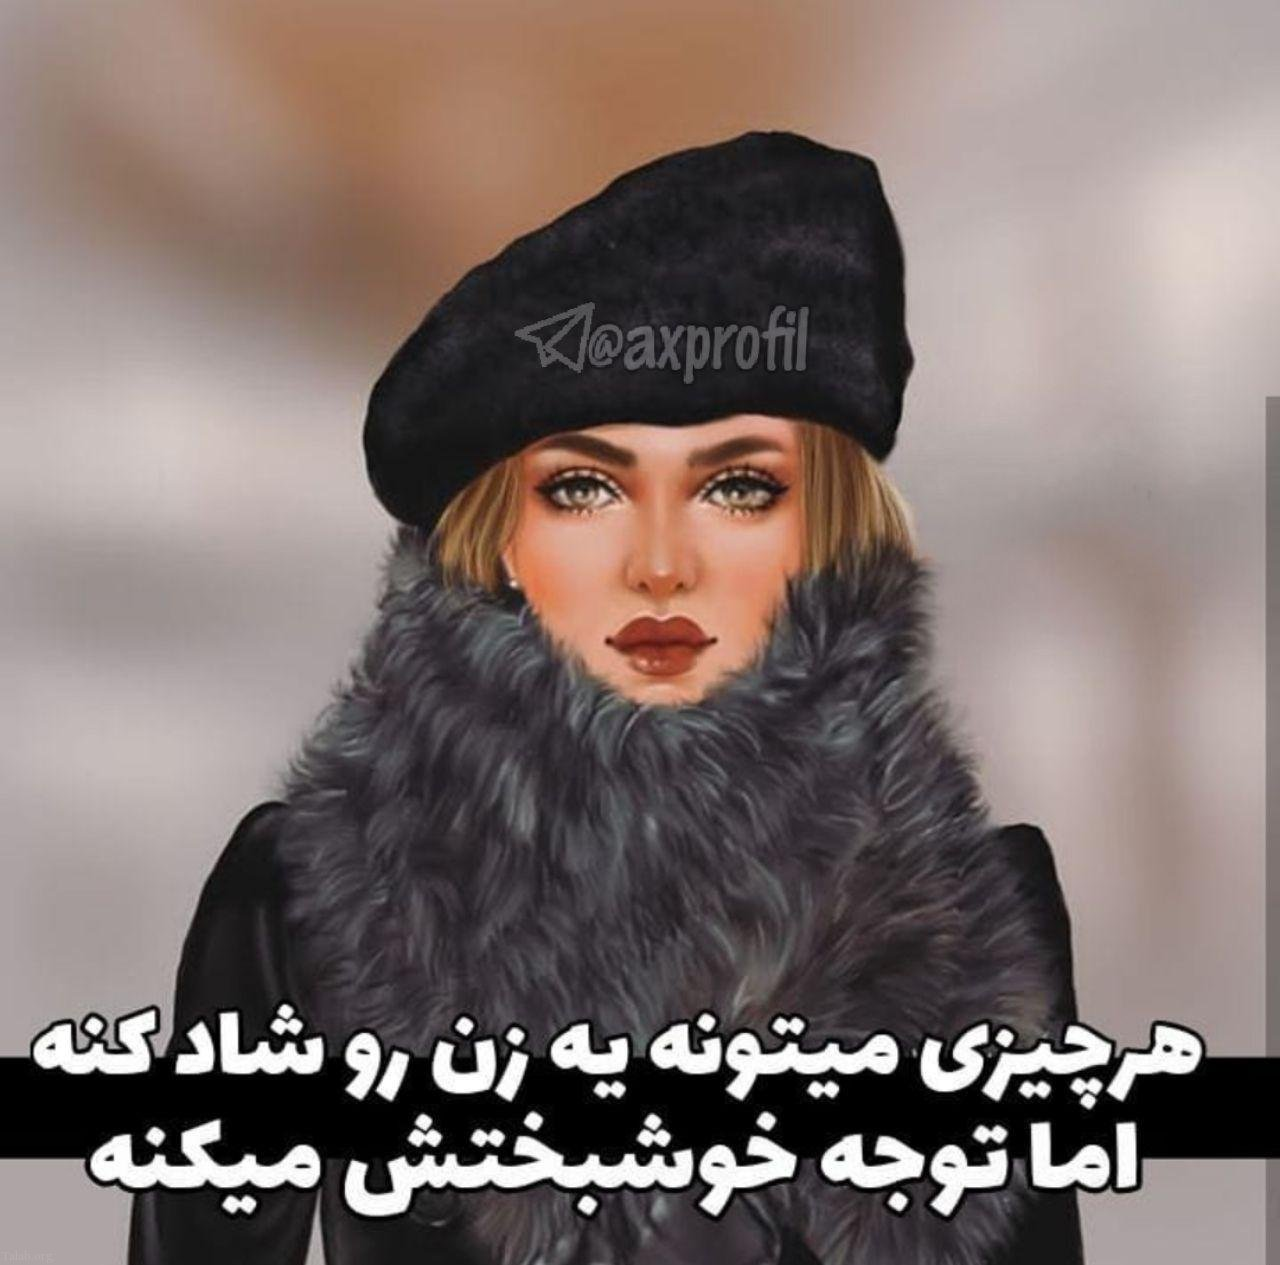 عکس پروفایل دخترونه خاص | عکس پروفایل دخترونه زیبا و فانتزی